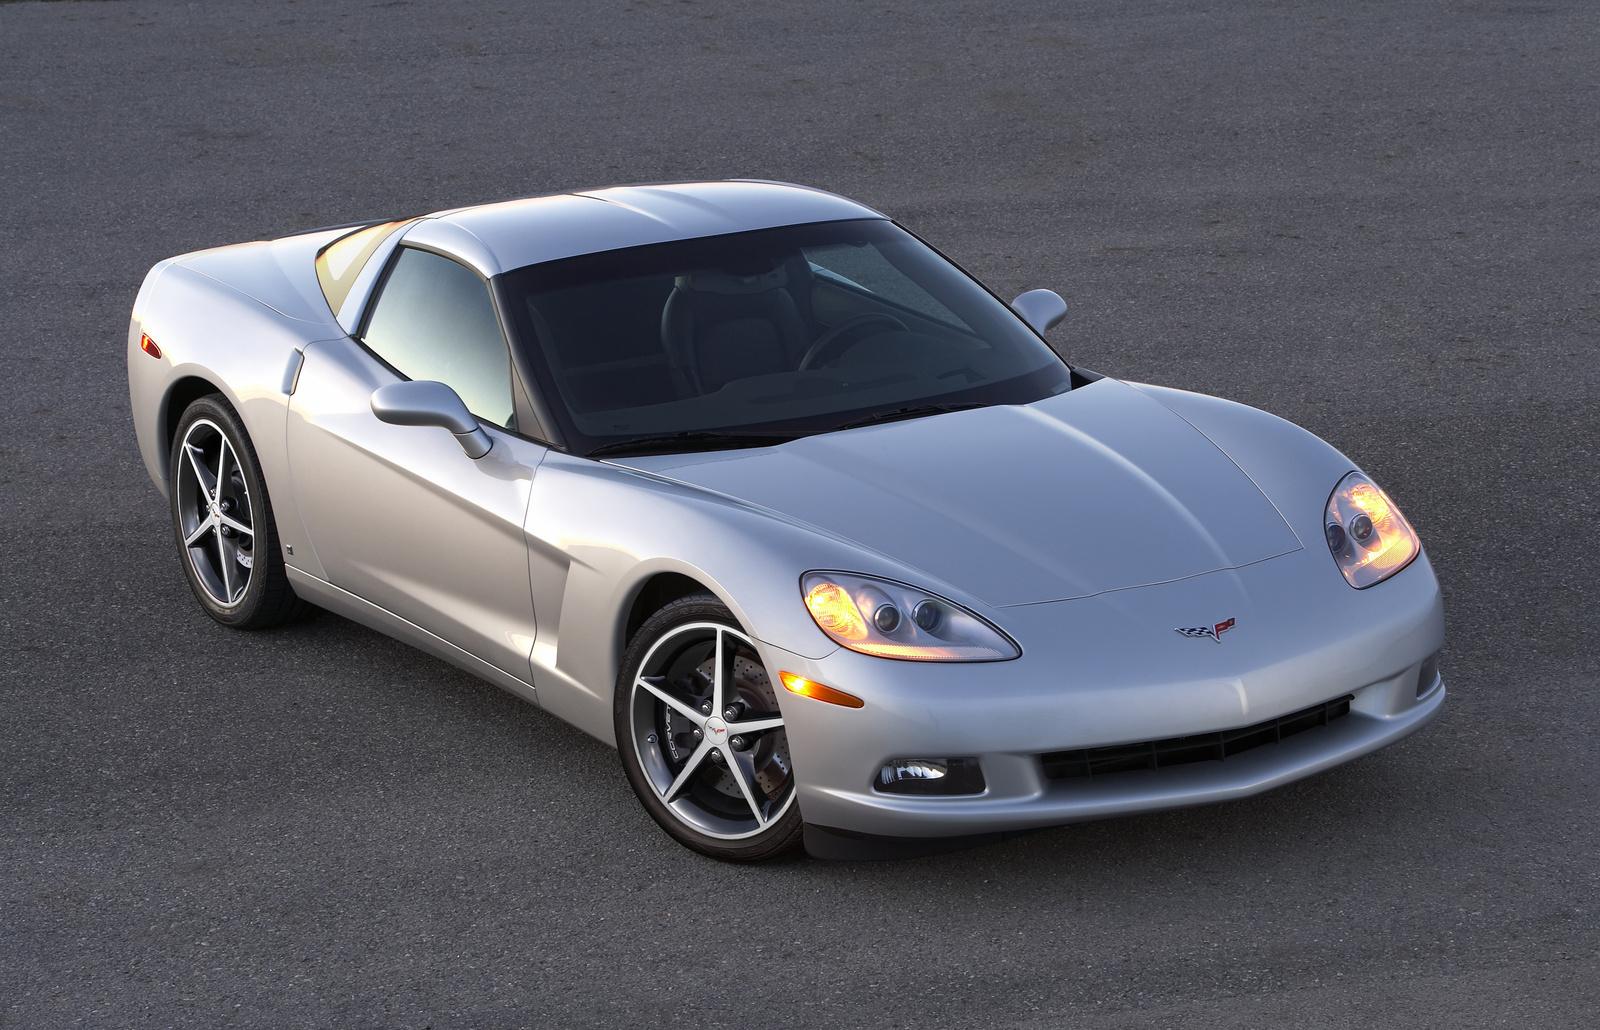 2013 Chevrolet Corvette - Overview - CarGurus